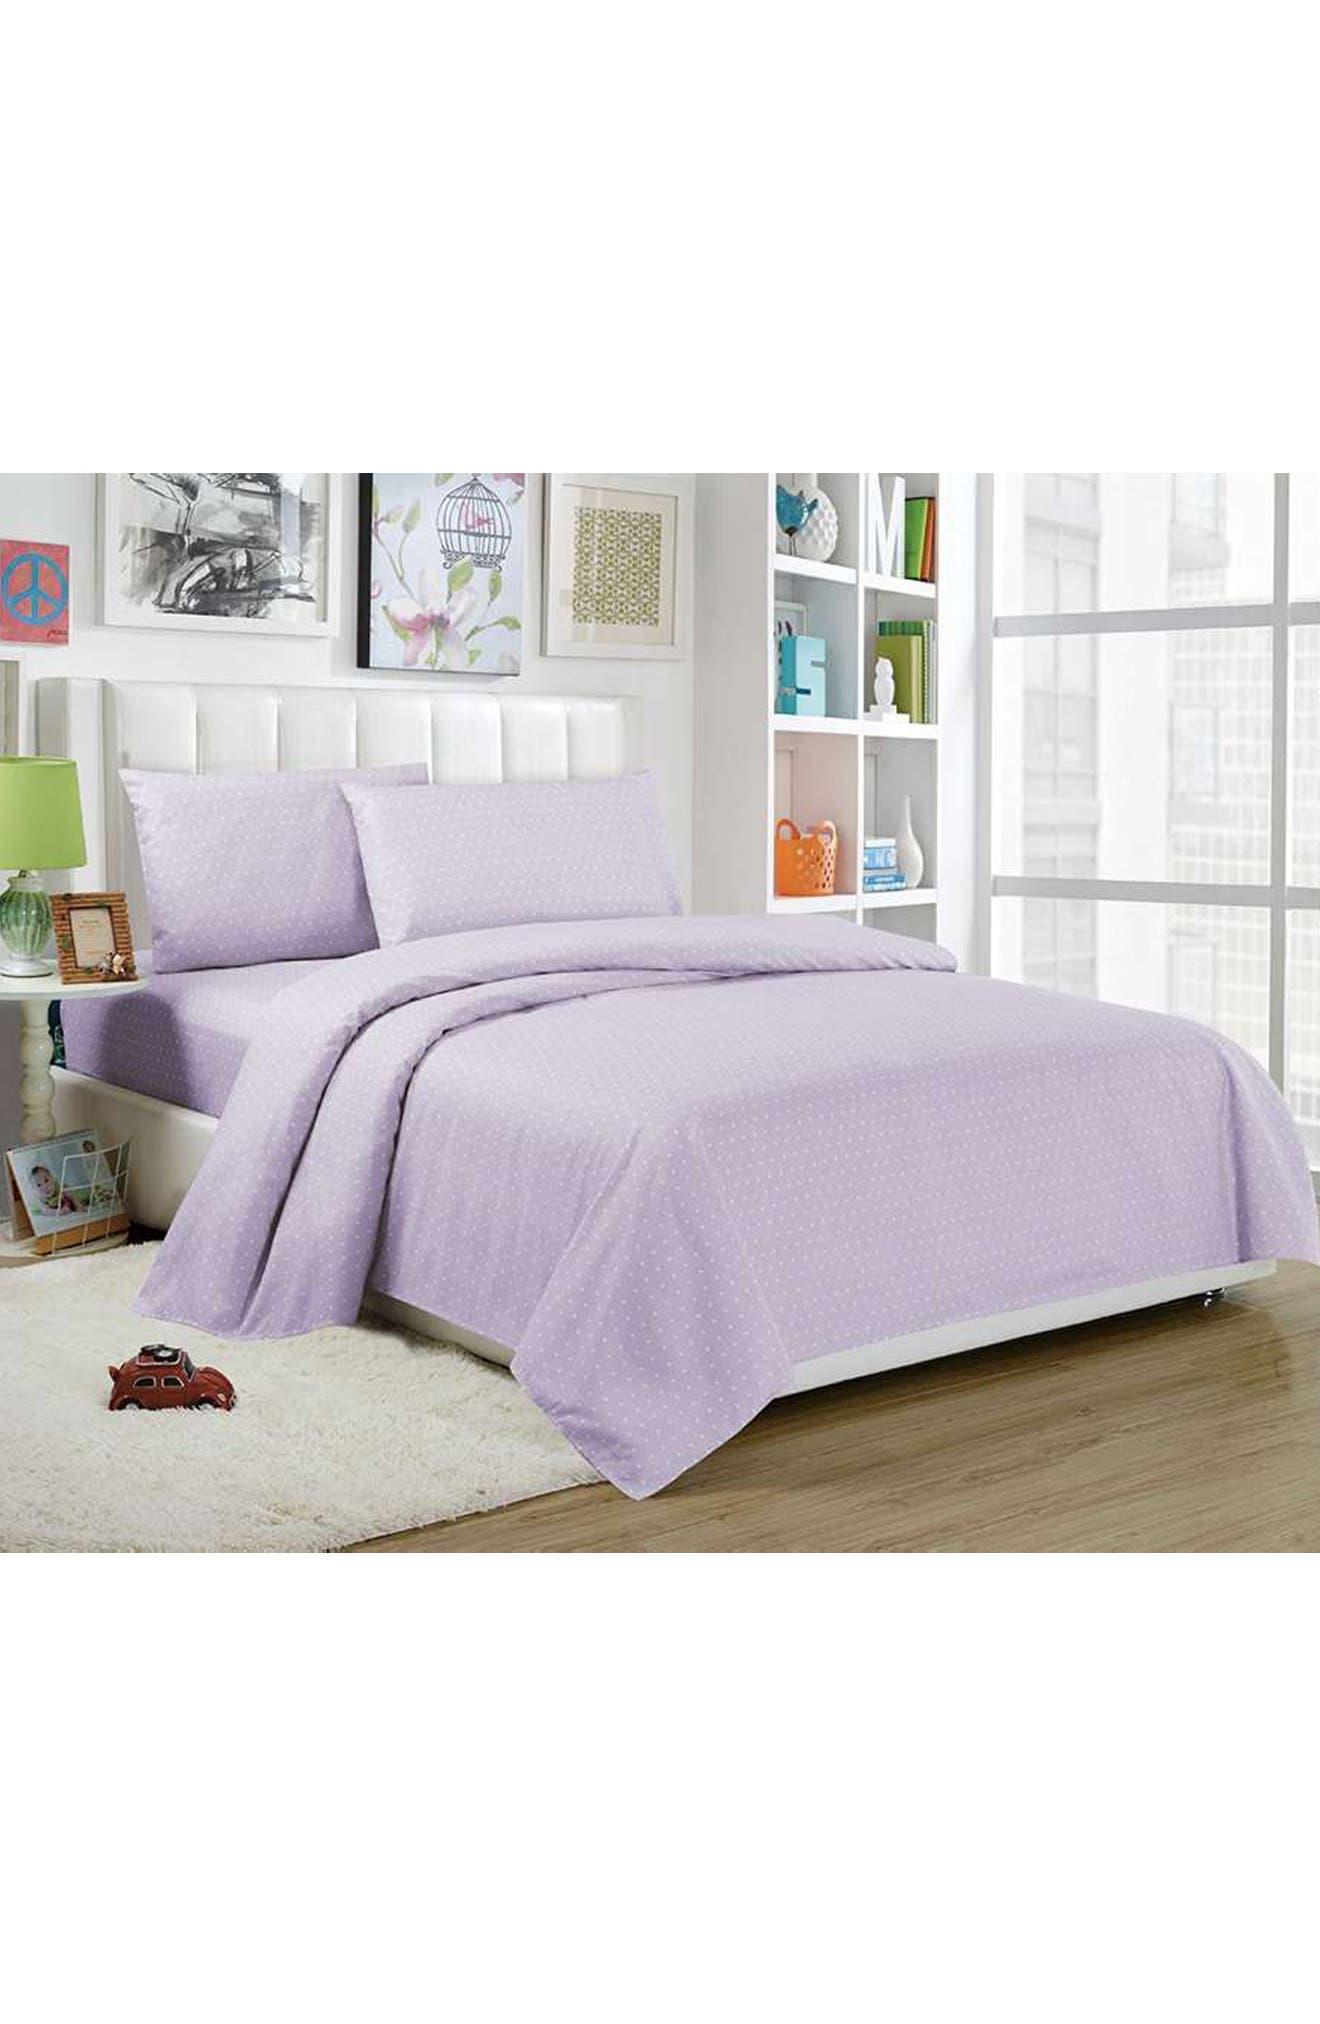 Trina 4- Piece Full Sheet Set,                         Main,                         color, Lavender